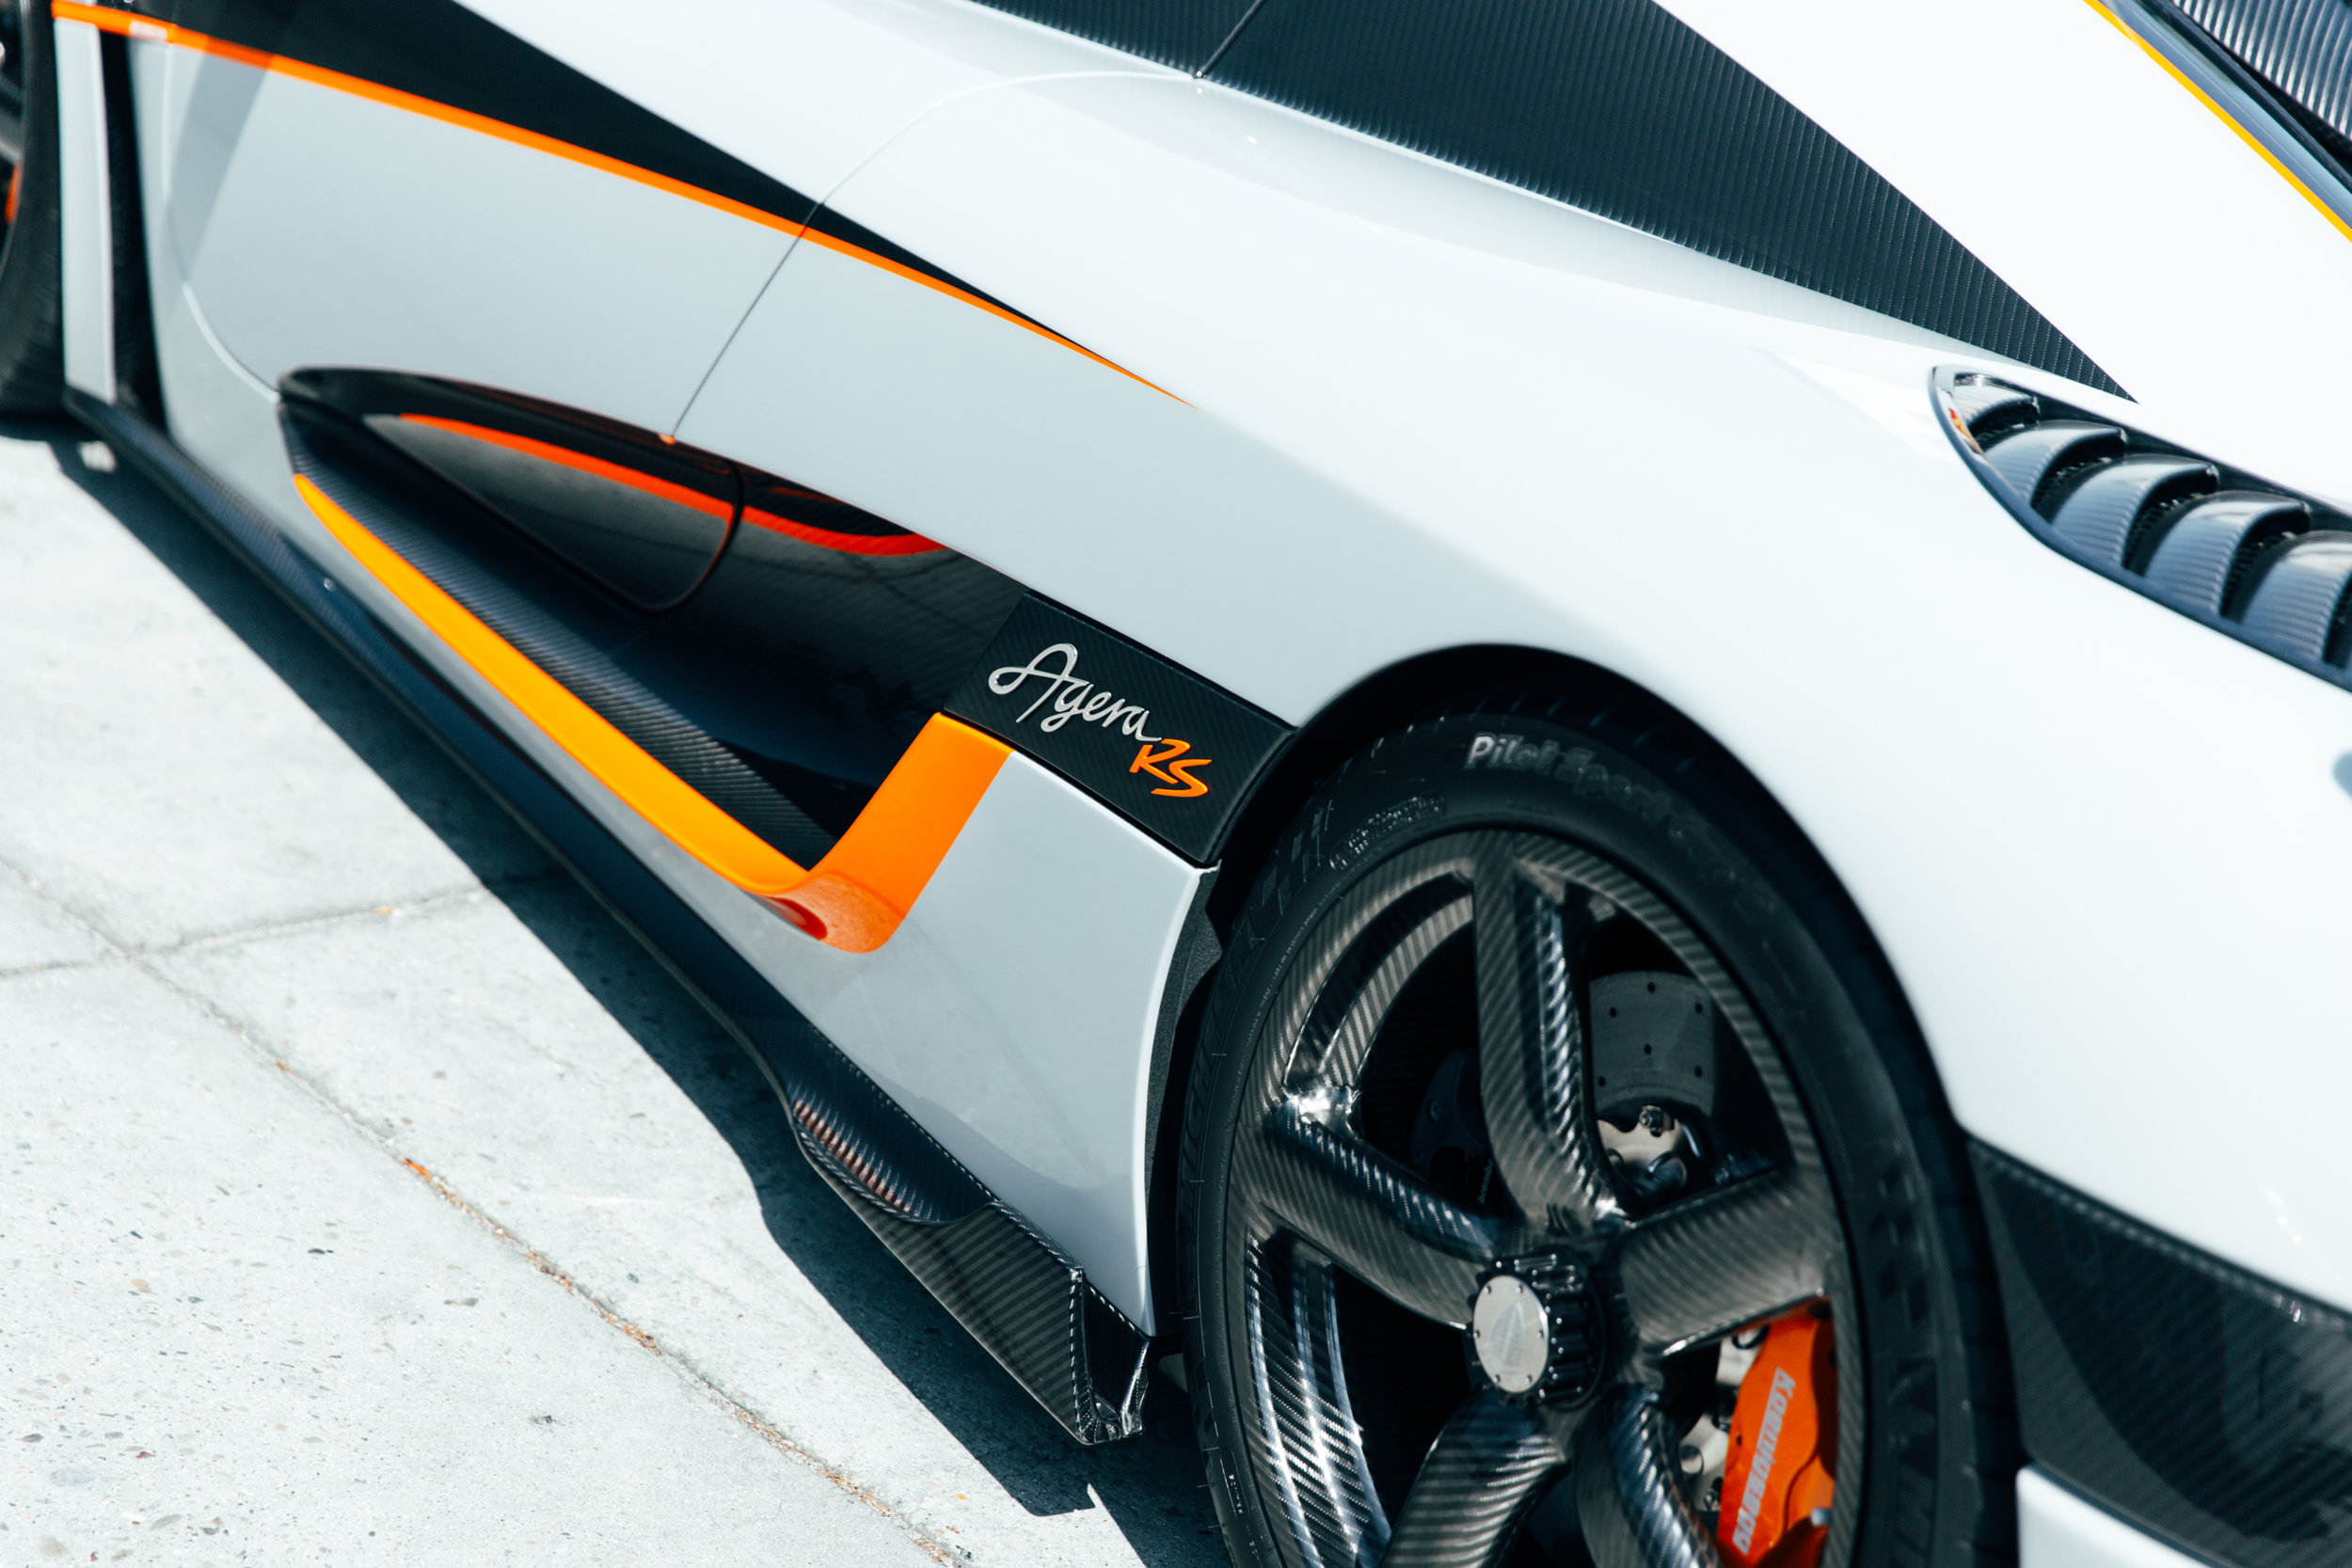 Stay_Driven_Monterey_Car_Week_Koenigsegg-66.jpg